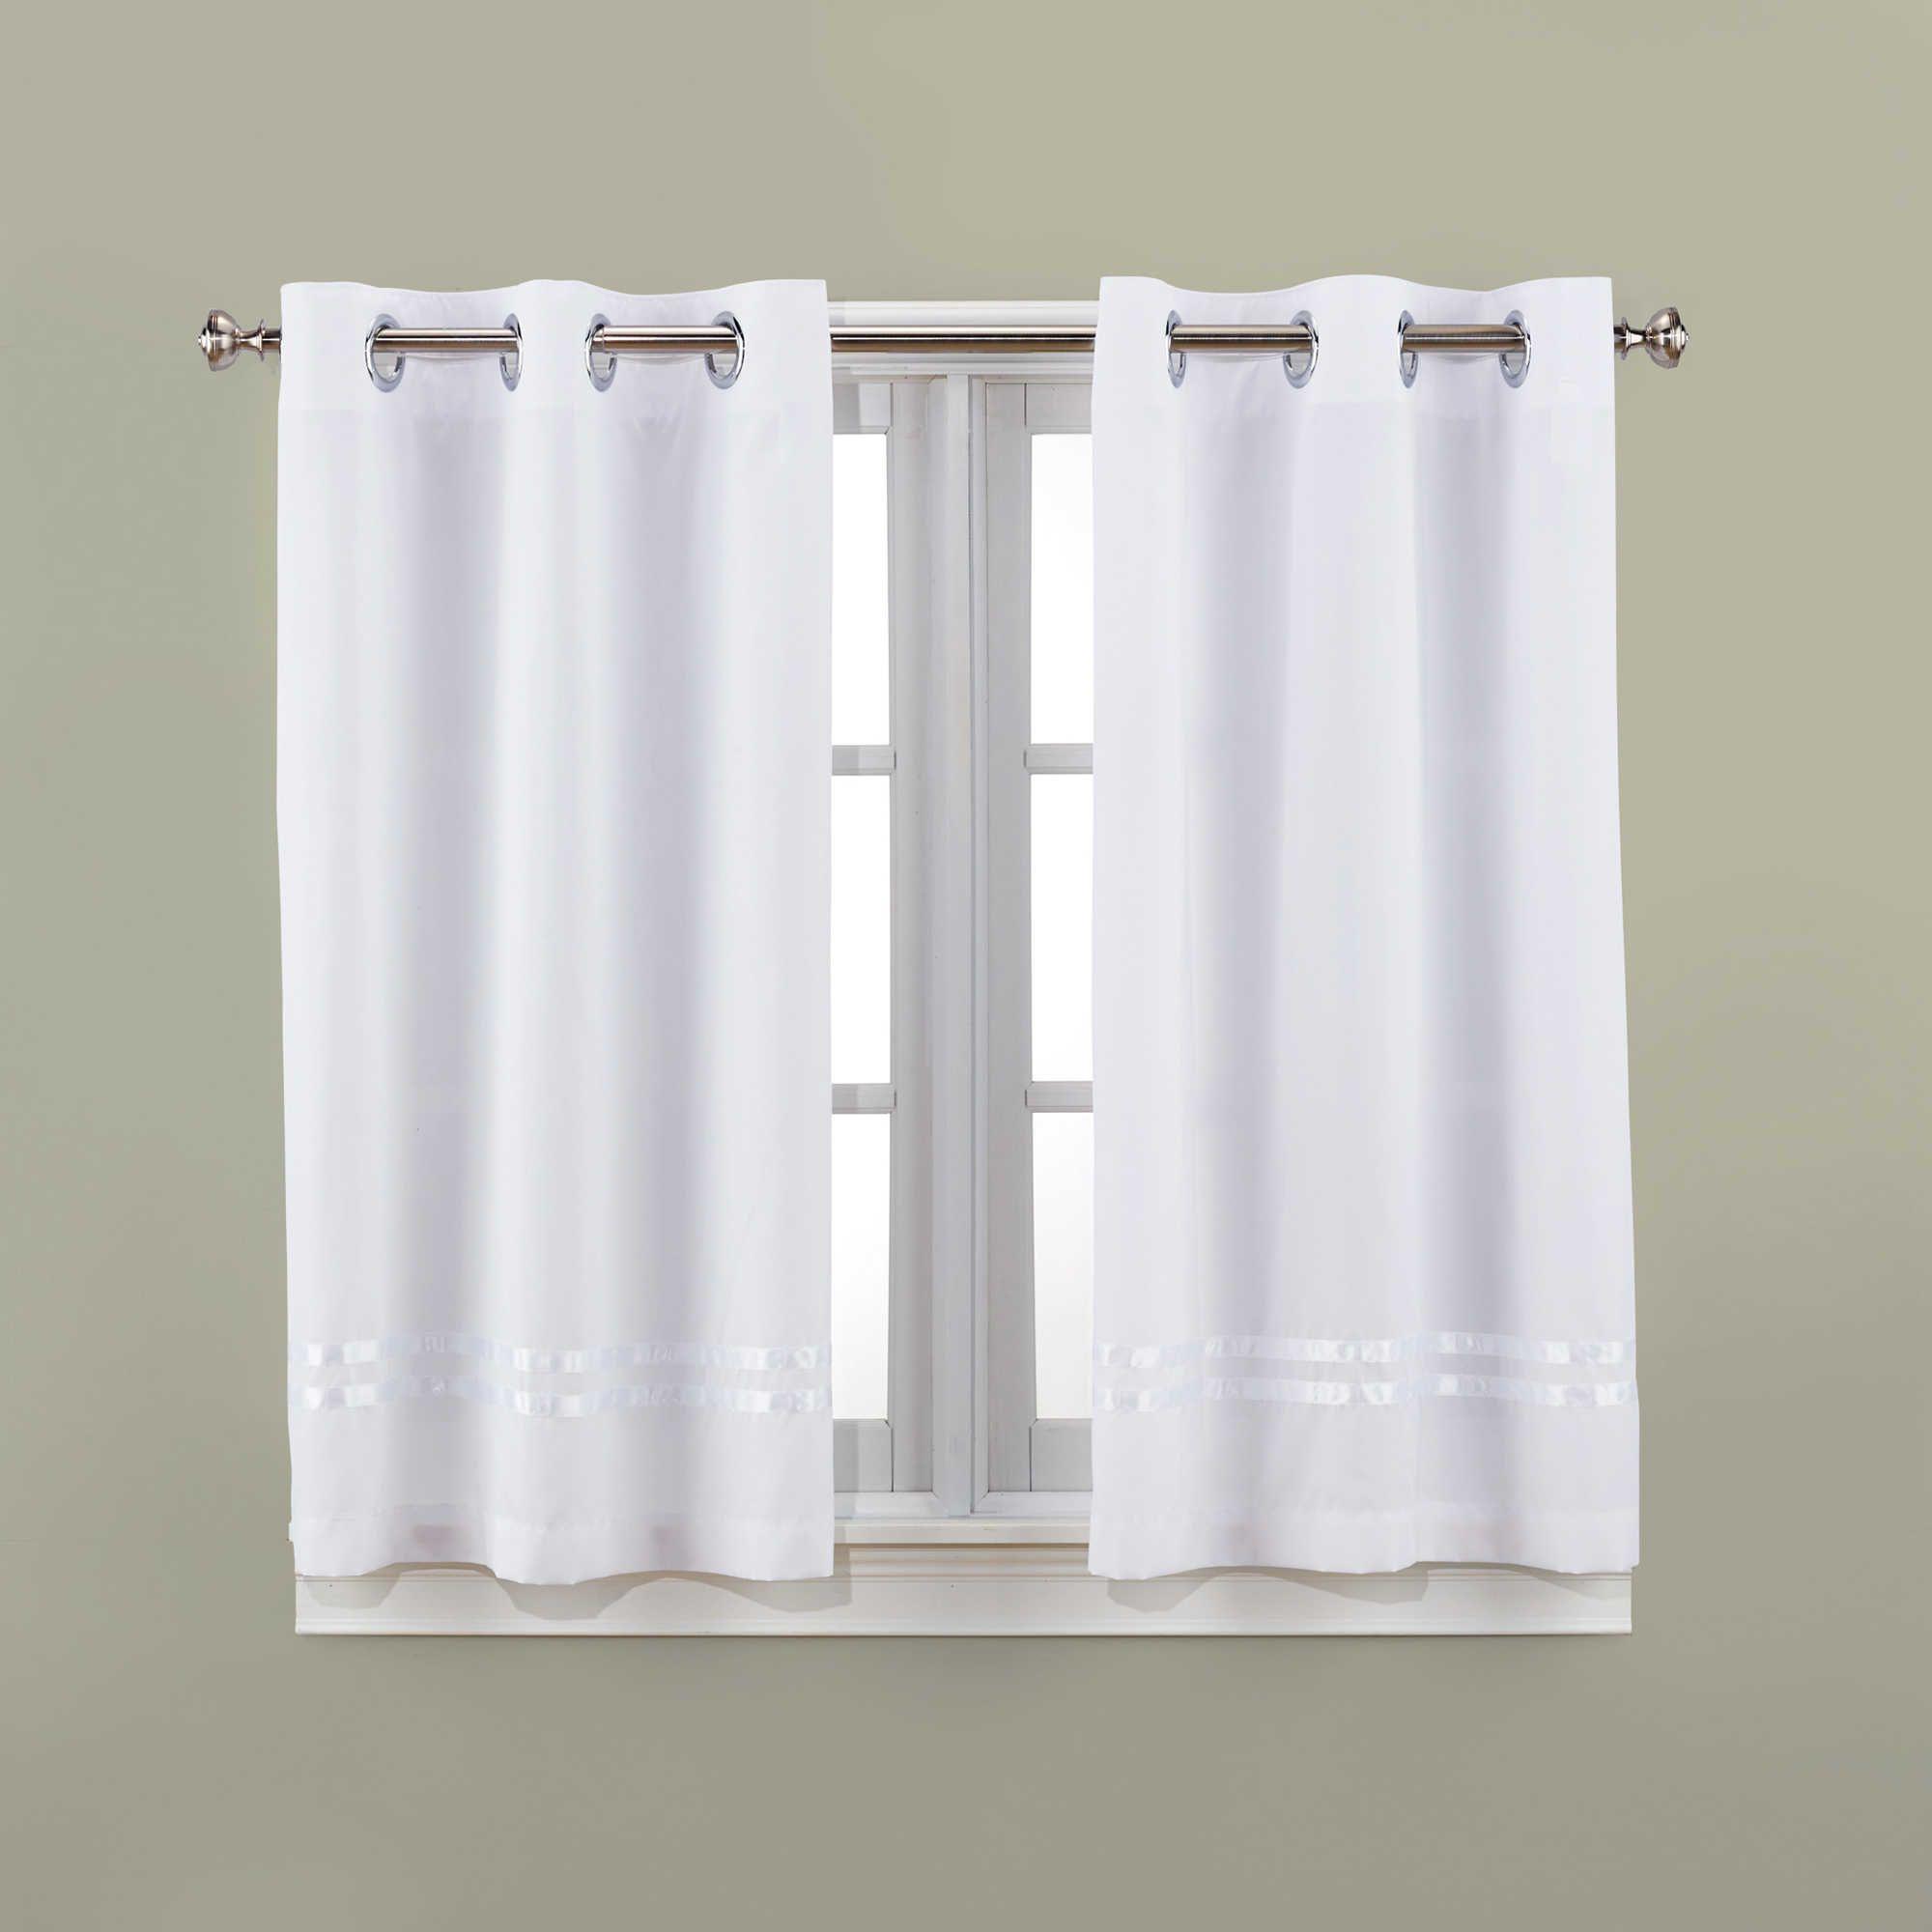 Hookless Escape 45 Inch Bath Window Curtain Panels In White Bath Window Window In Shower Bathroom Window Curtains